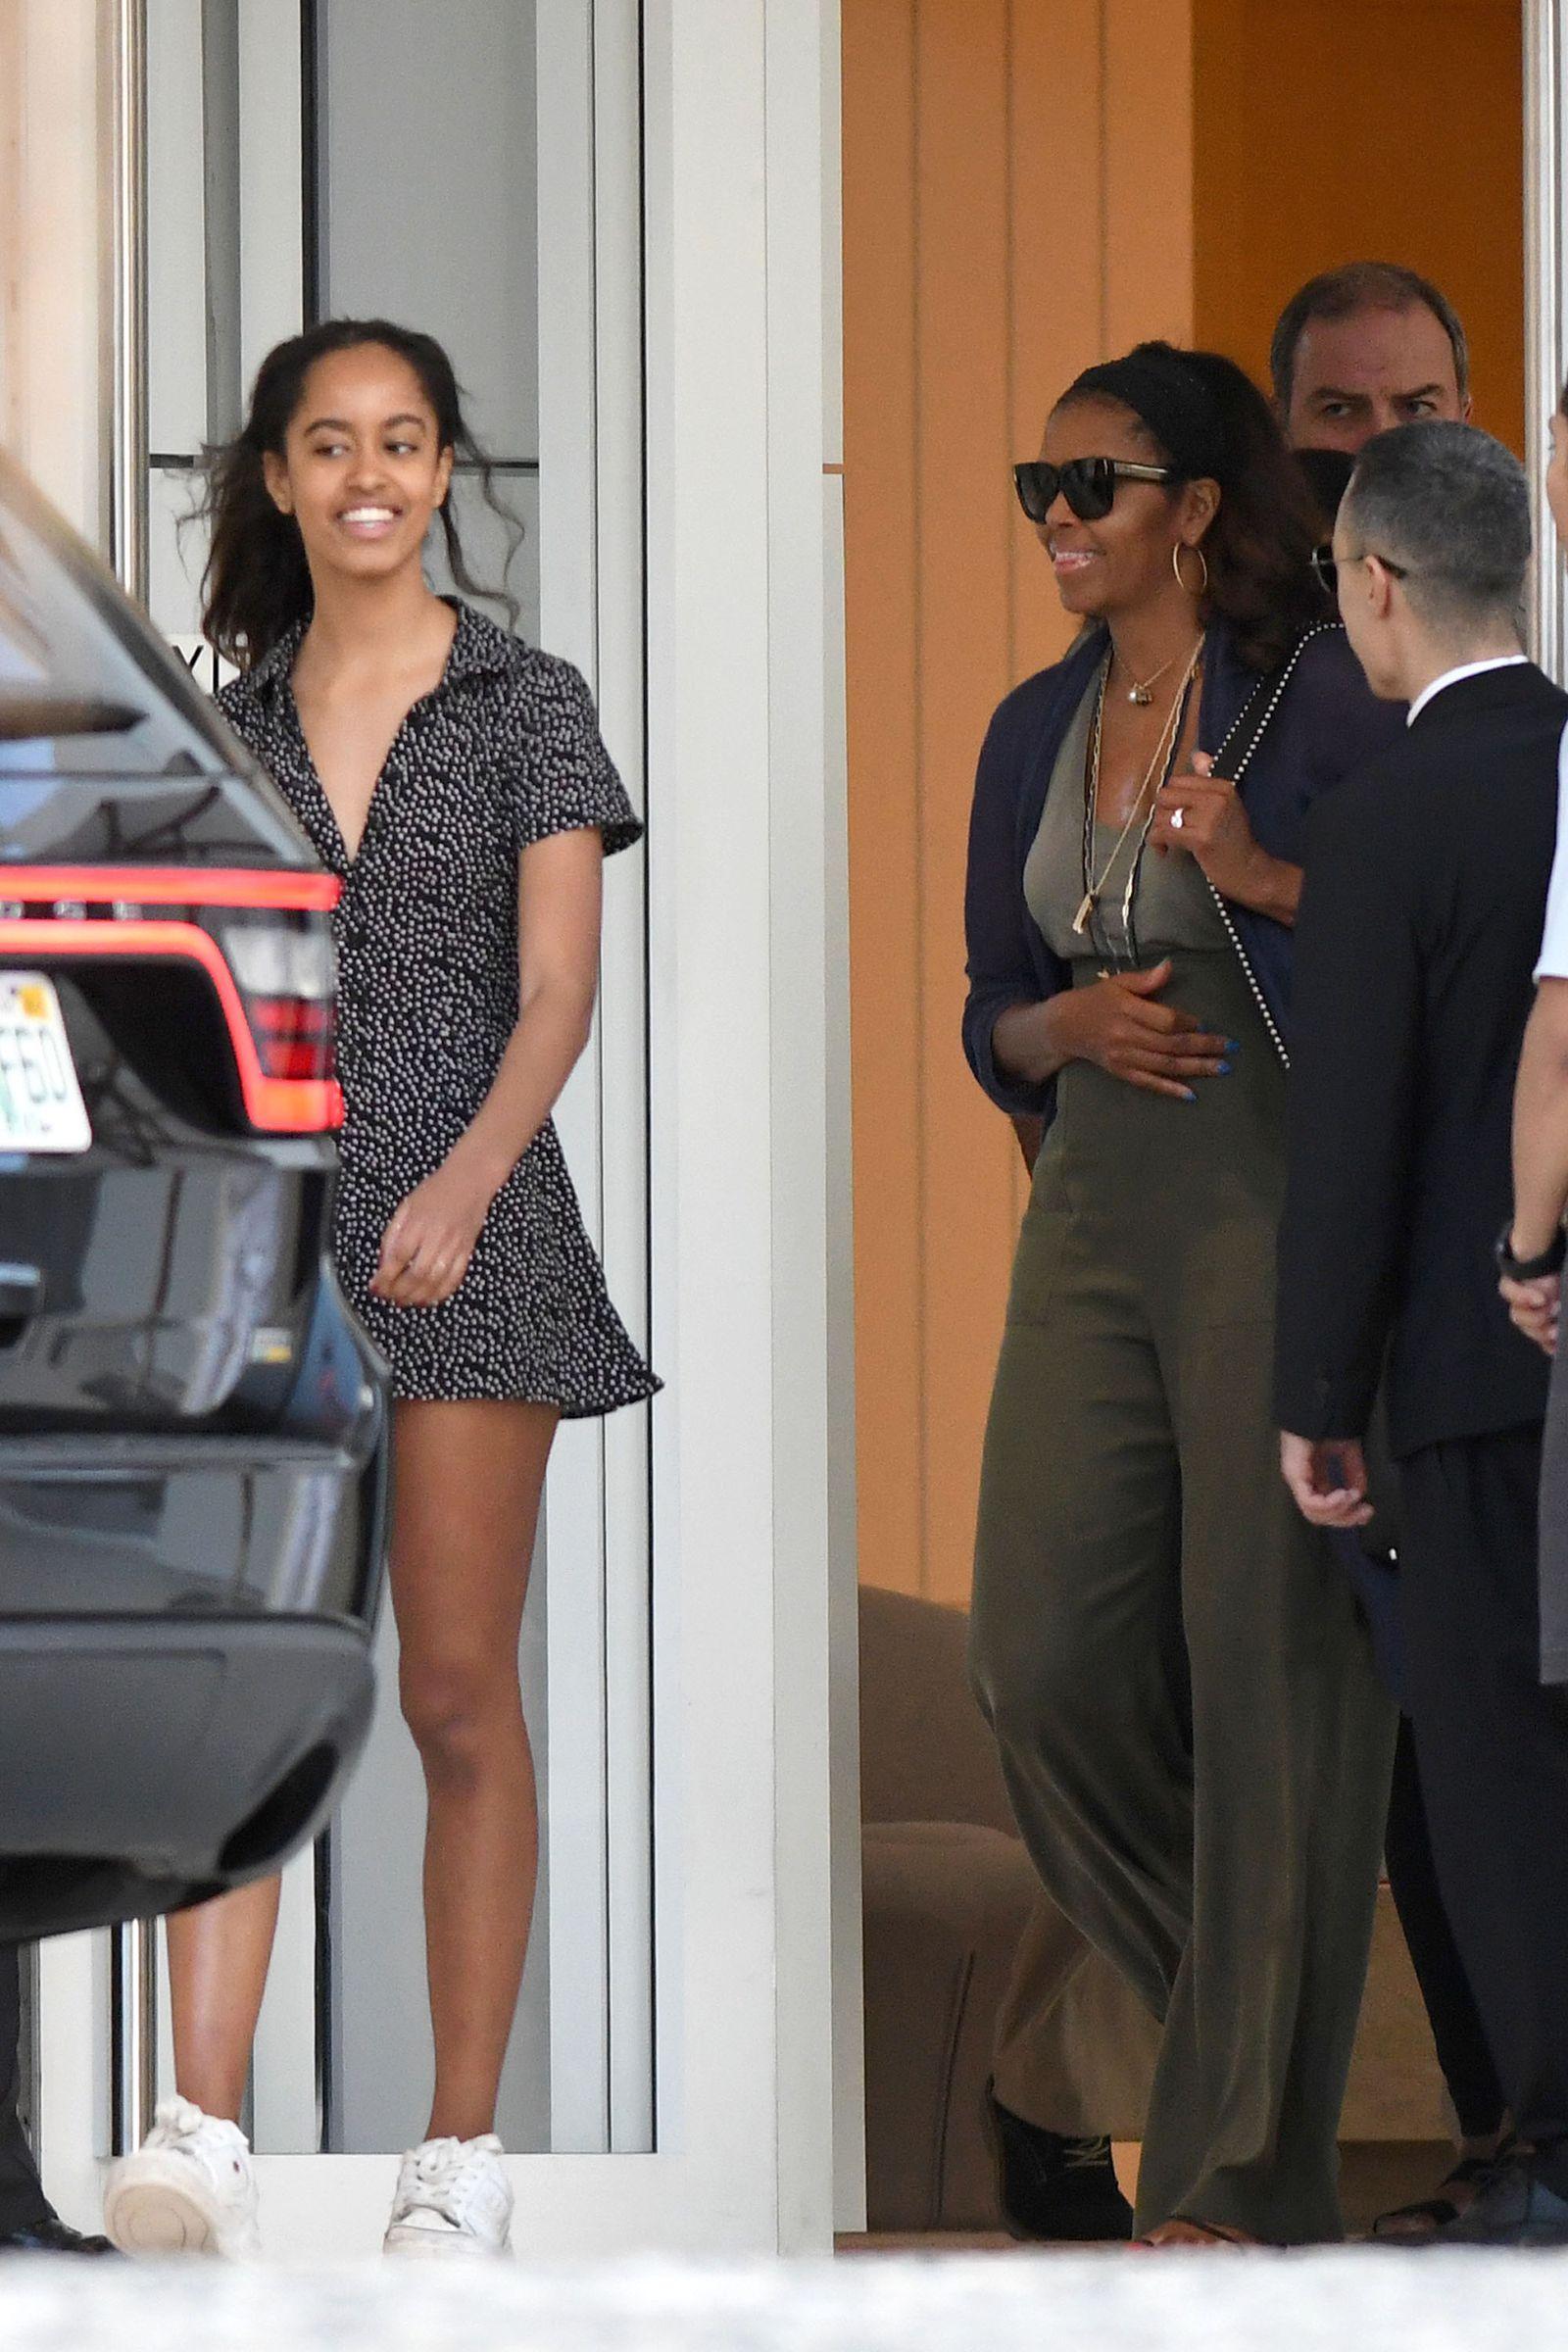 750e7c1966ea Michelle and Malia Obama Had a Mother-Daughter Beach Weekend in Miami -  HarpersBAZAAR.com